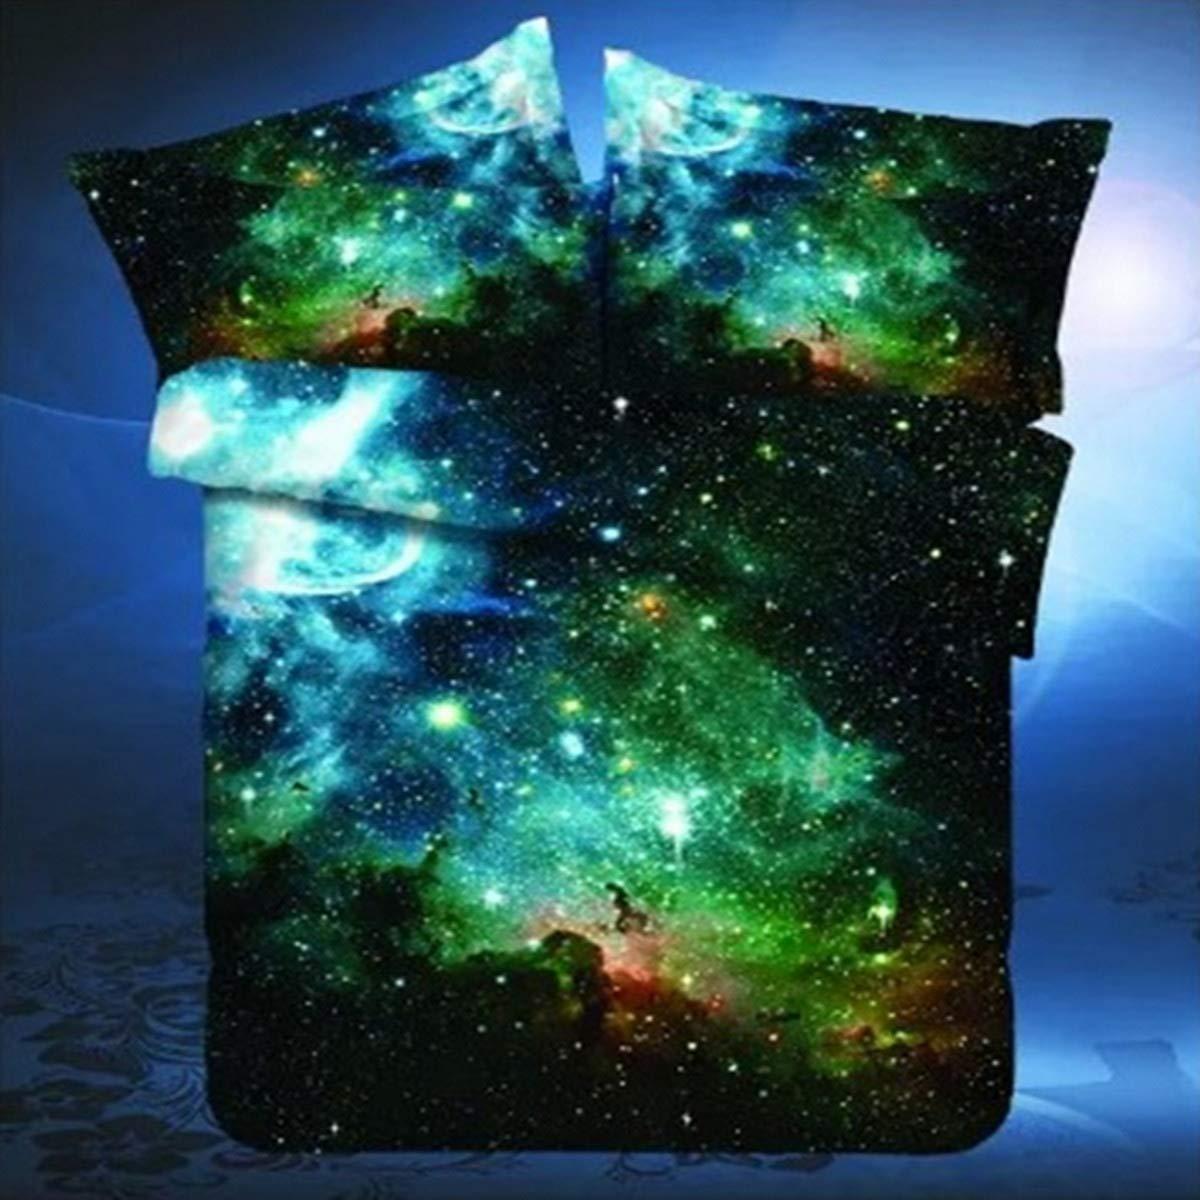 Galaxy Bedding セットClose to Galaxy Realize Your Dream イージー掛け布団カバー/枕カバー クイーンサイズ B07JWBKW2S